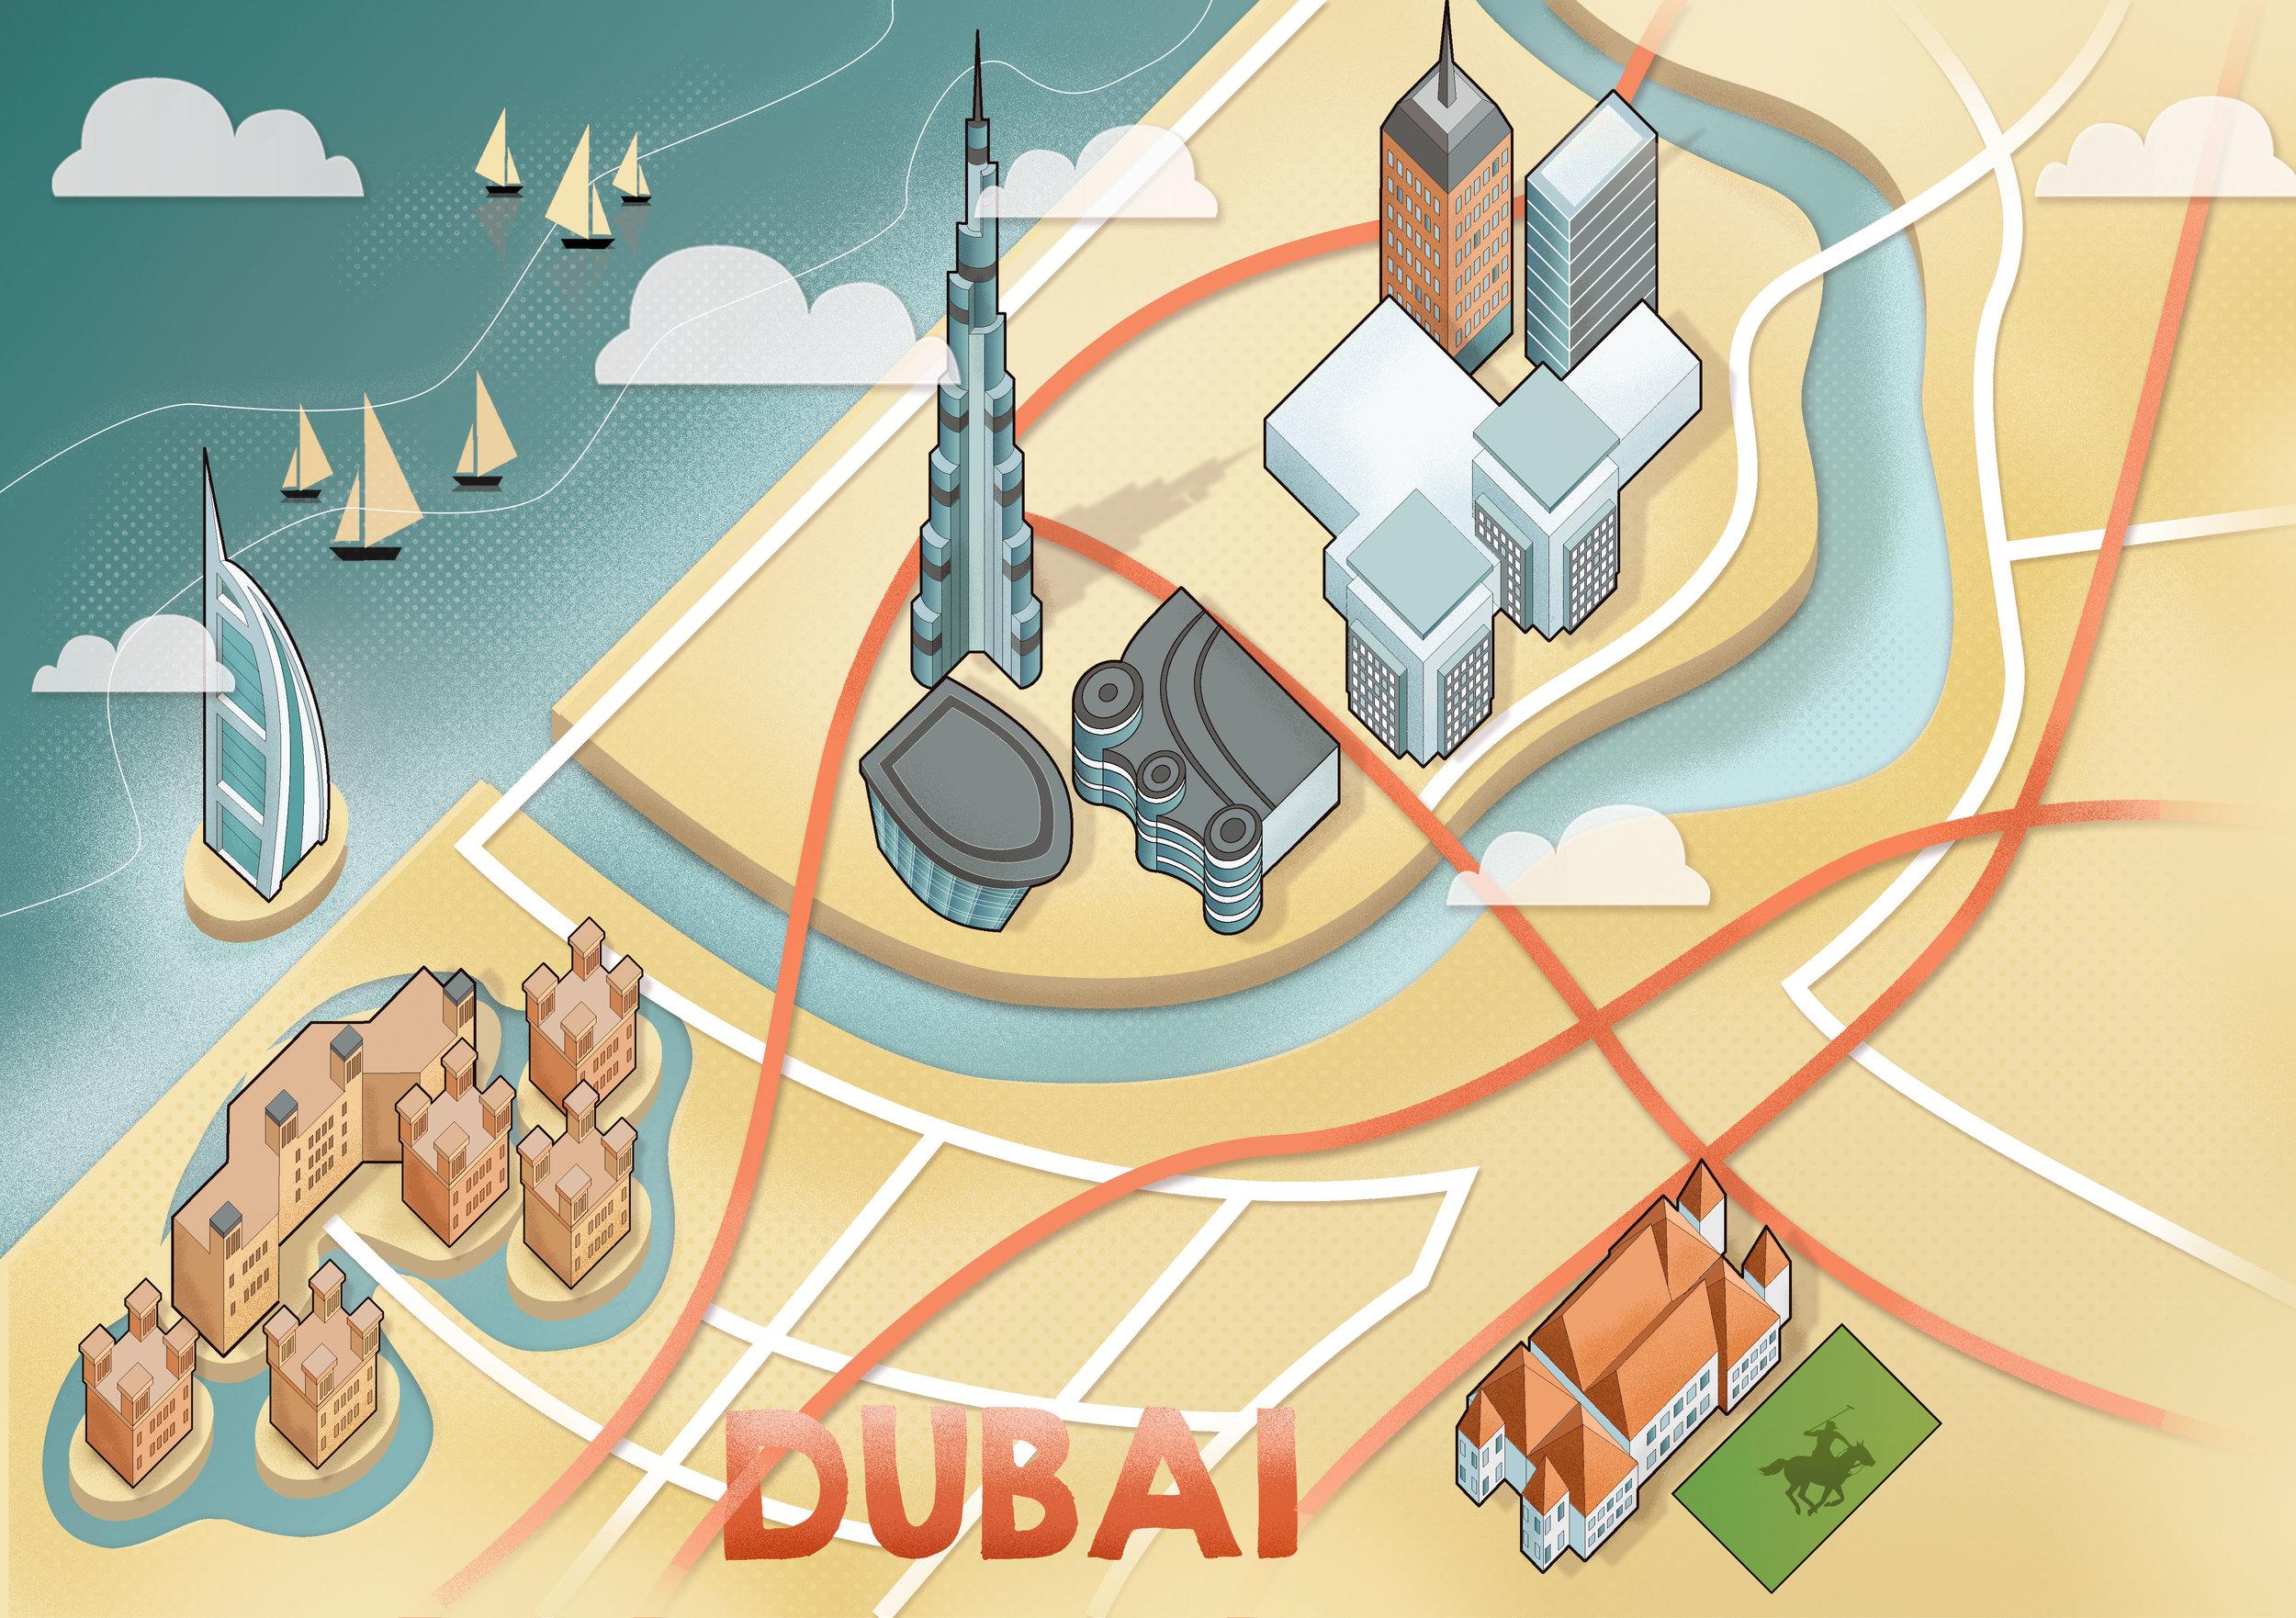 Reddin Designs Dubai Map Illustration editorial